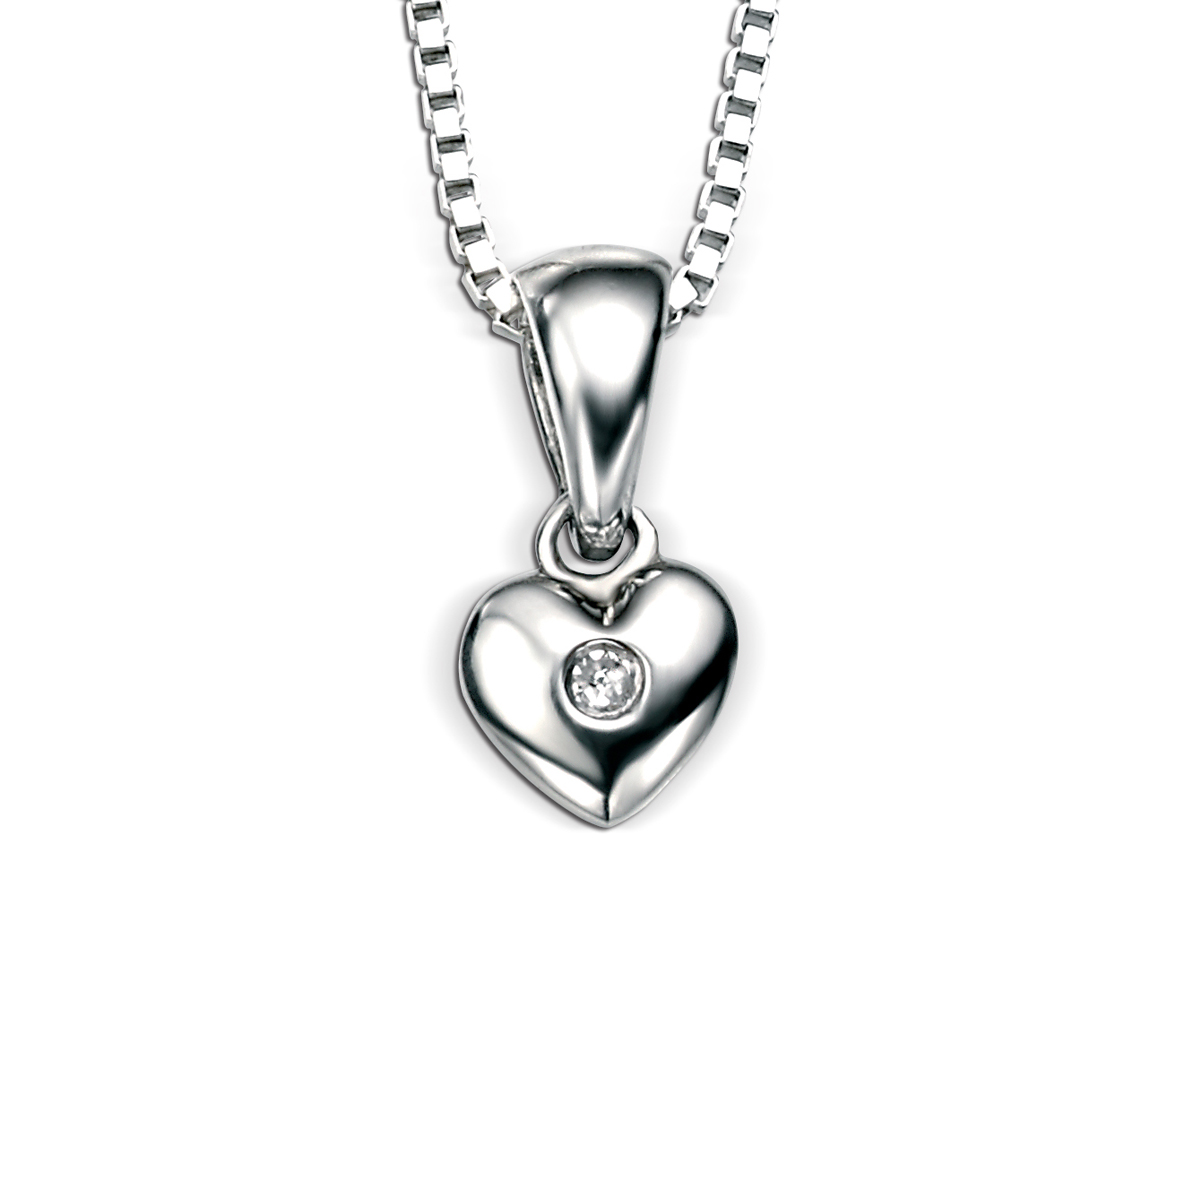 Girls heart pendant necklace silver 925 crocketts home shop jewellery necklaces girls heart pendant necklace silver 925 aloadofball Choice Image